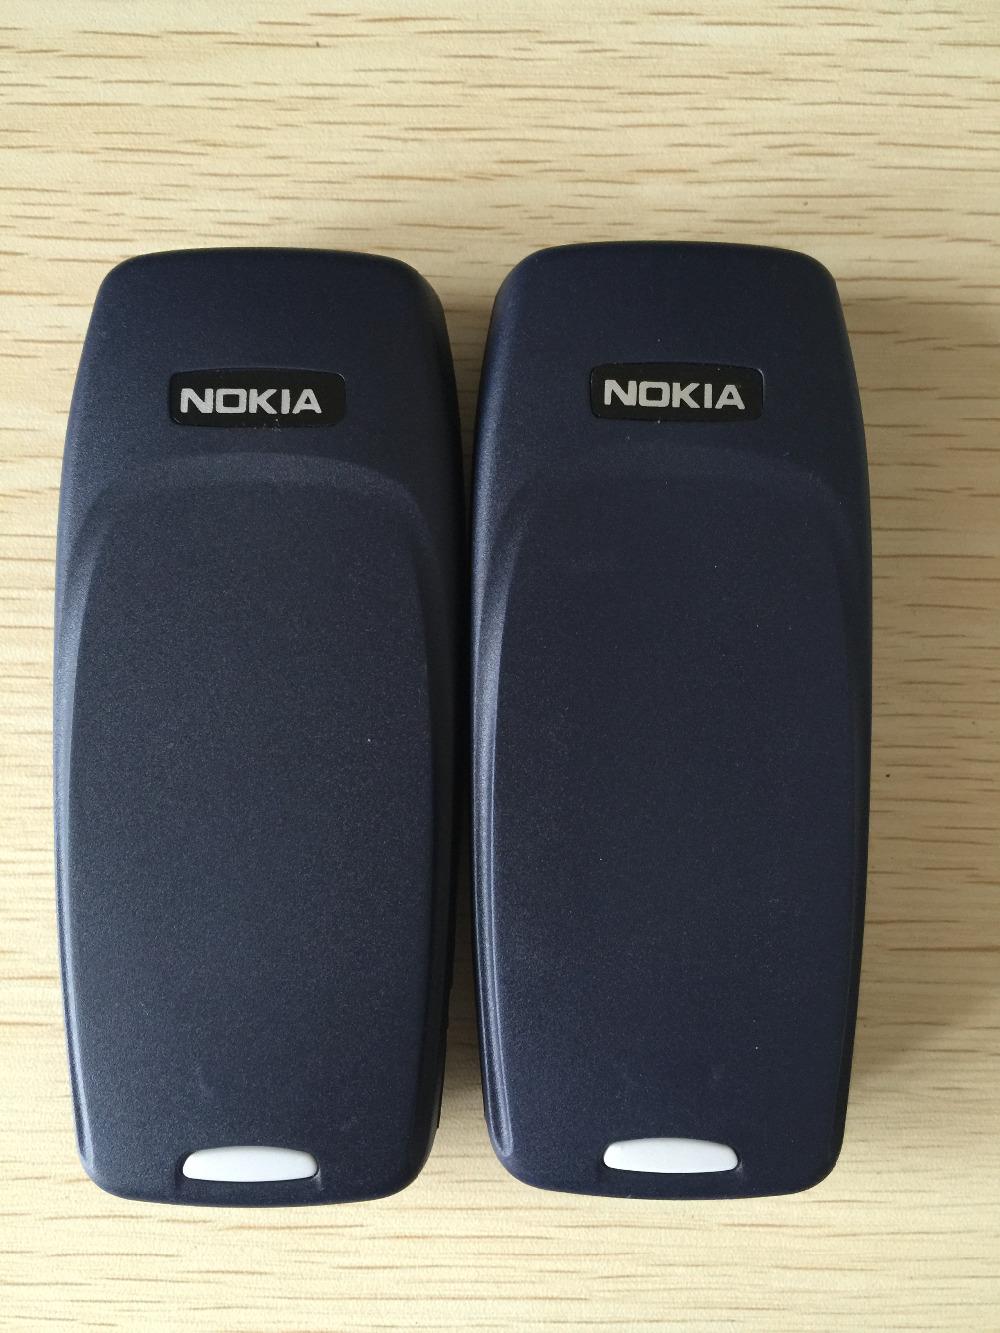 Refurbished phone Nokia 3310 cheap phone unlocked GSM 900/1800 with multi language dark blue 3